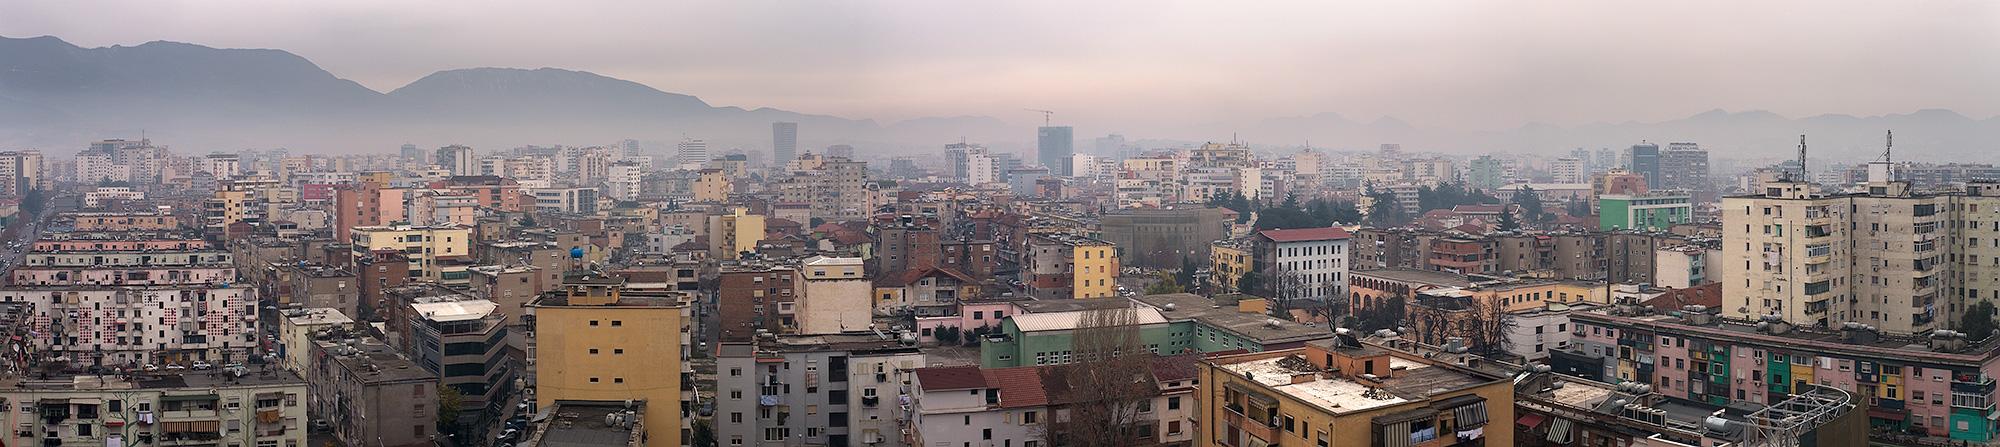 Tirane, the capitol of Albania